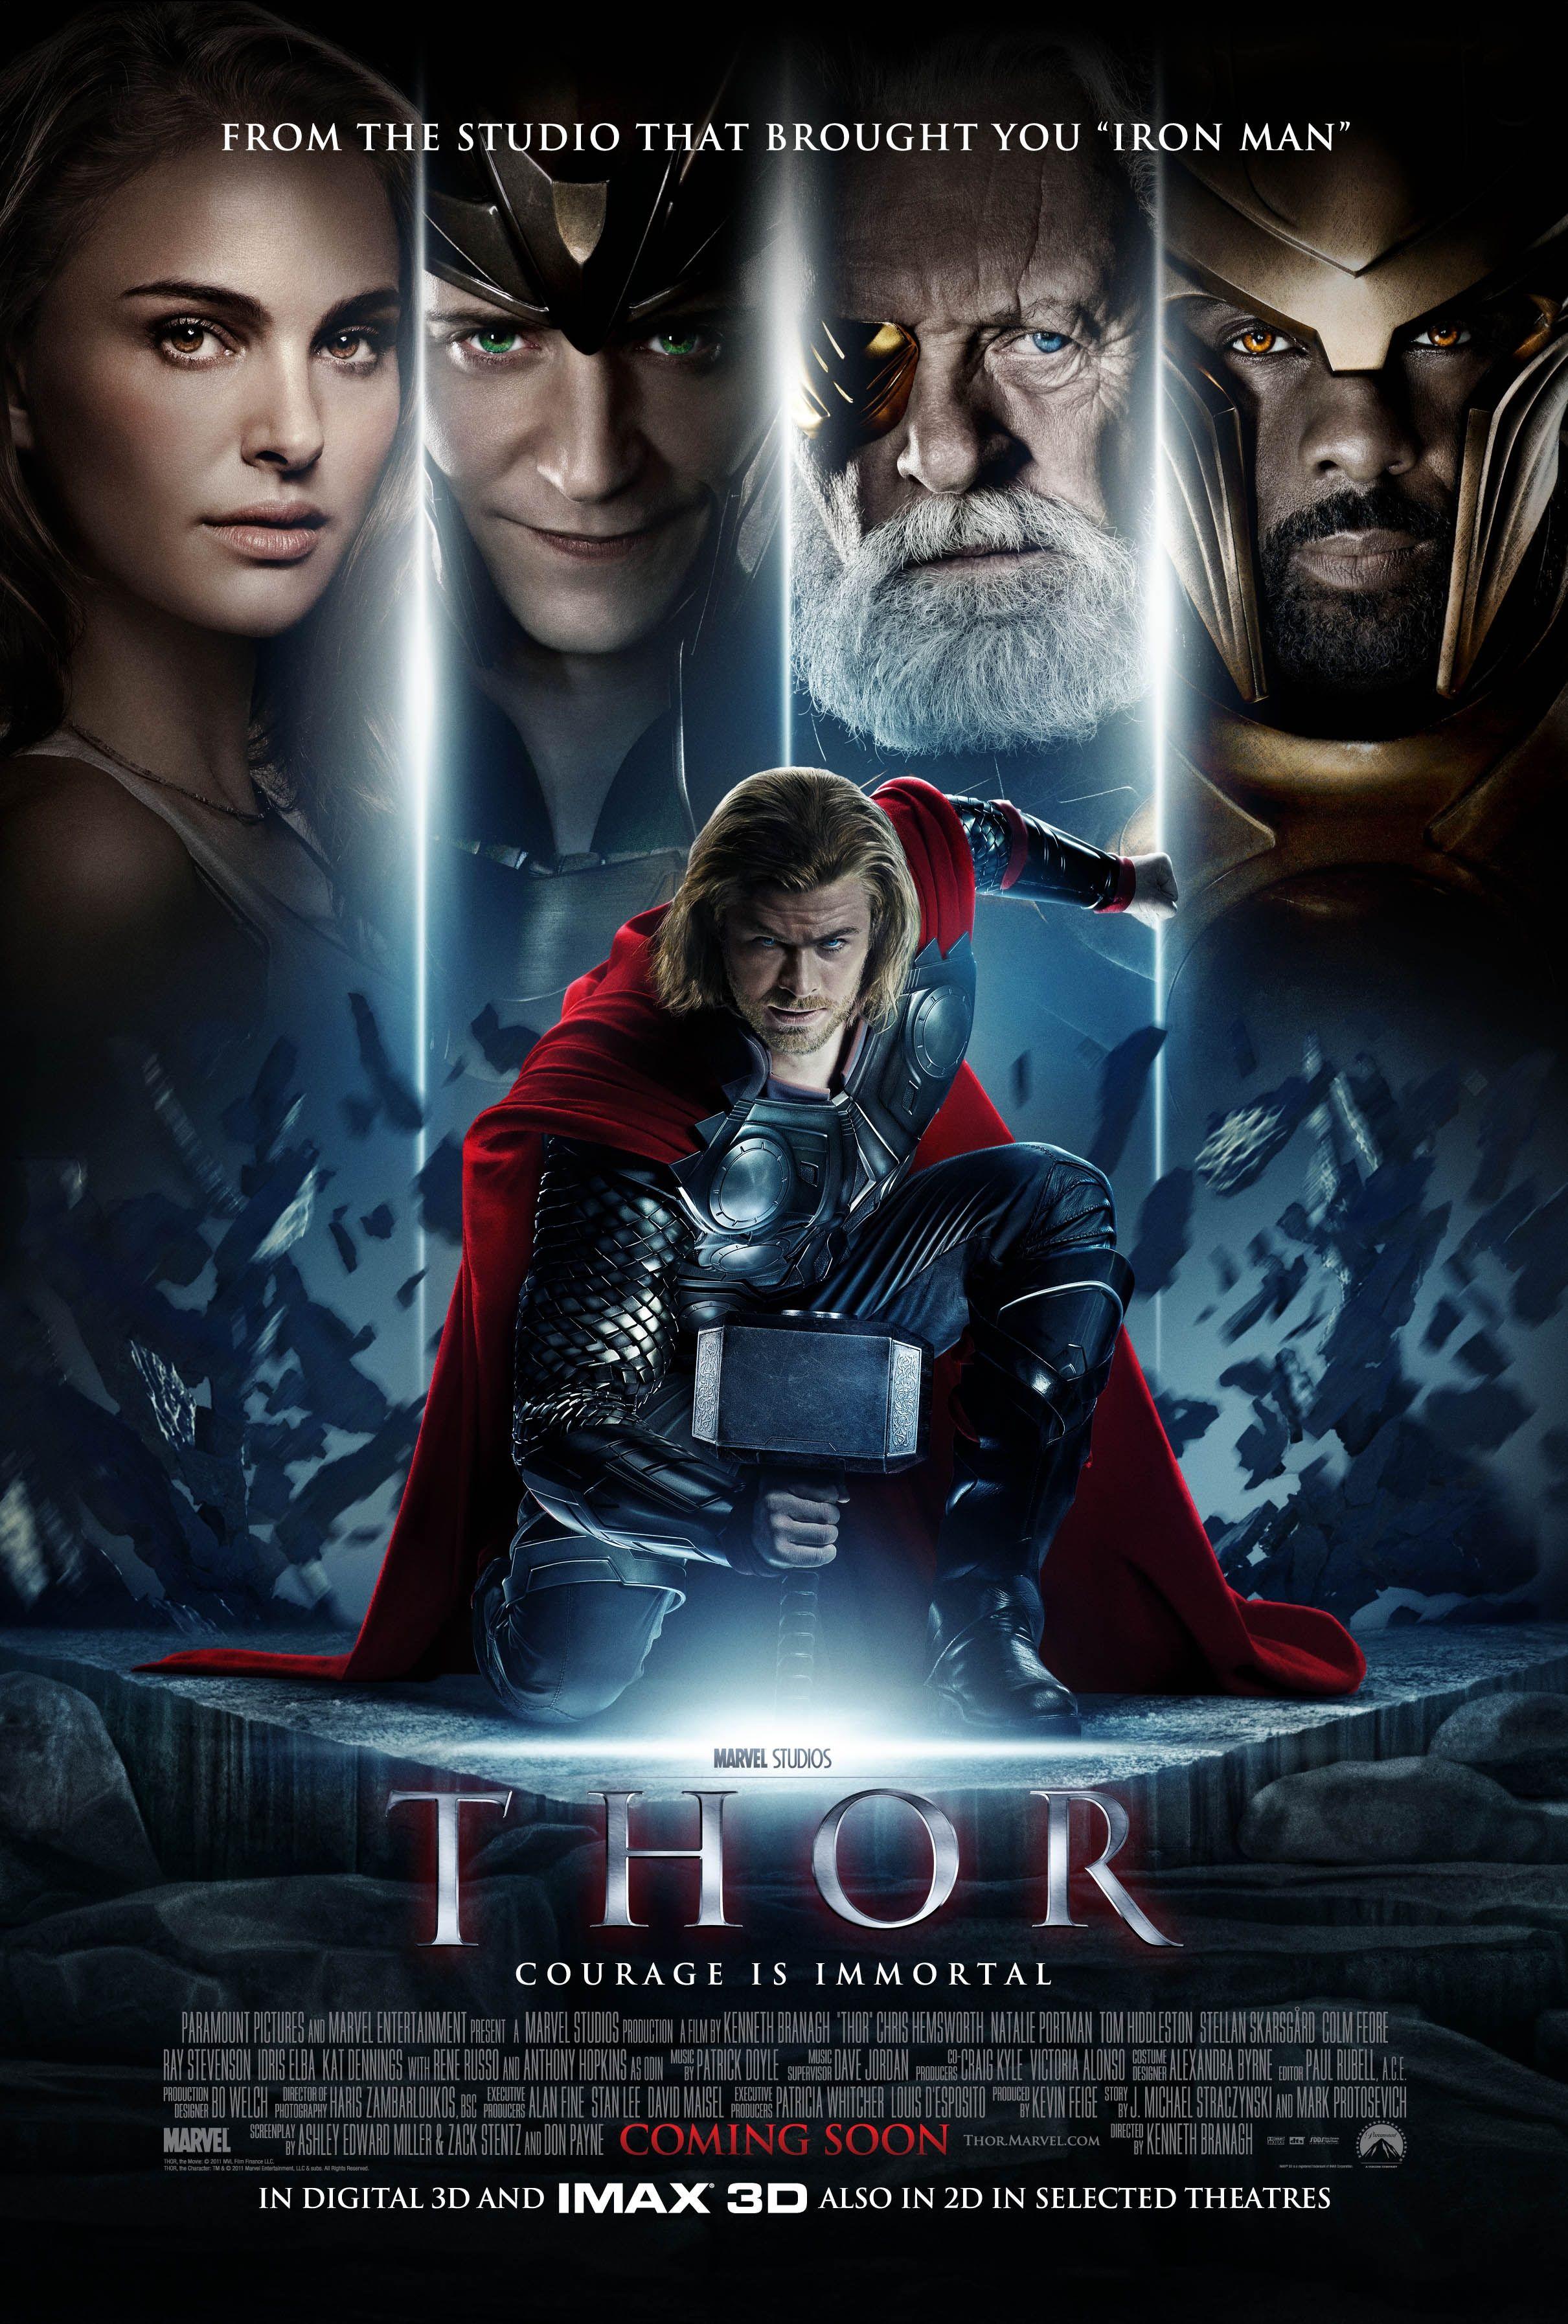 Thor_poster_02.jpg